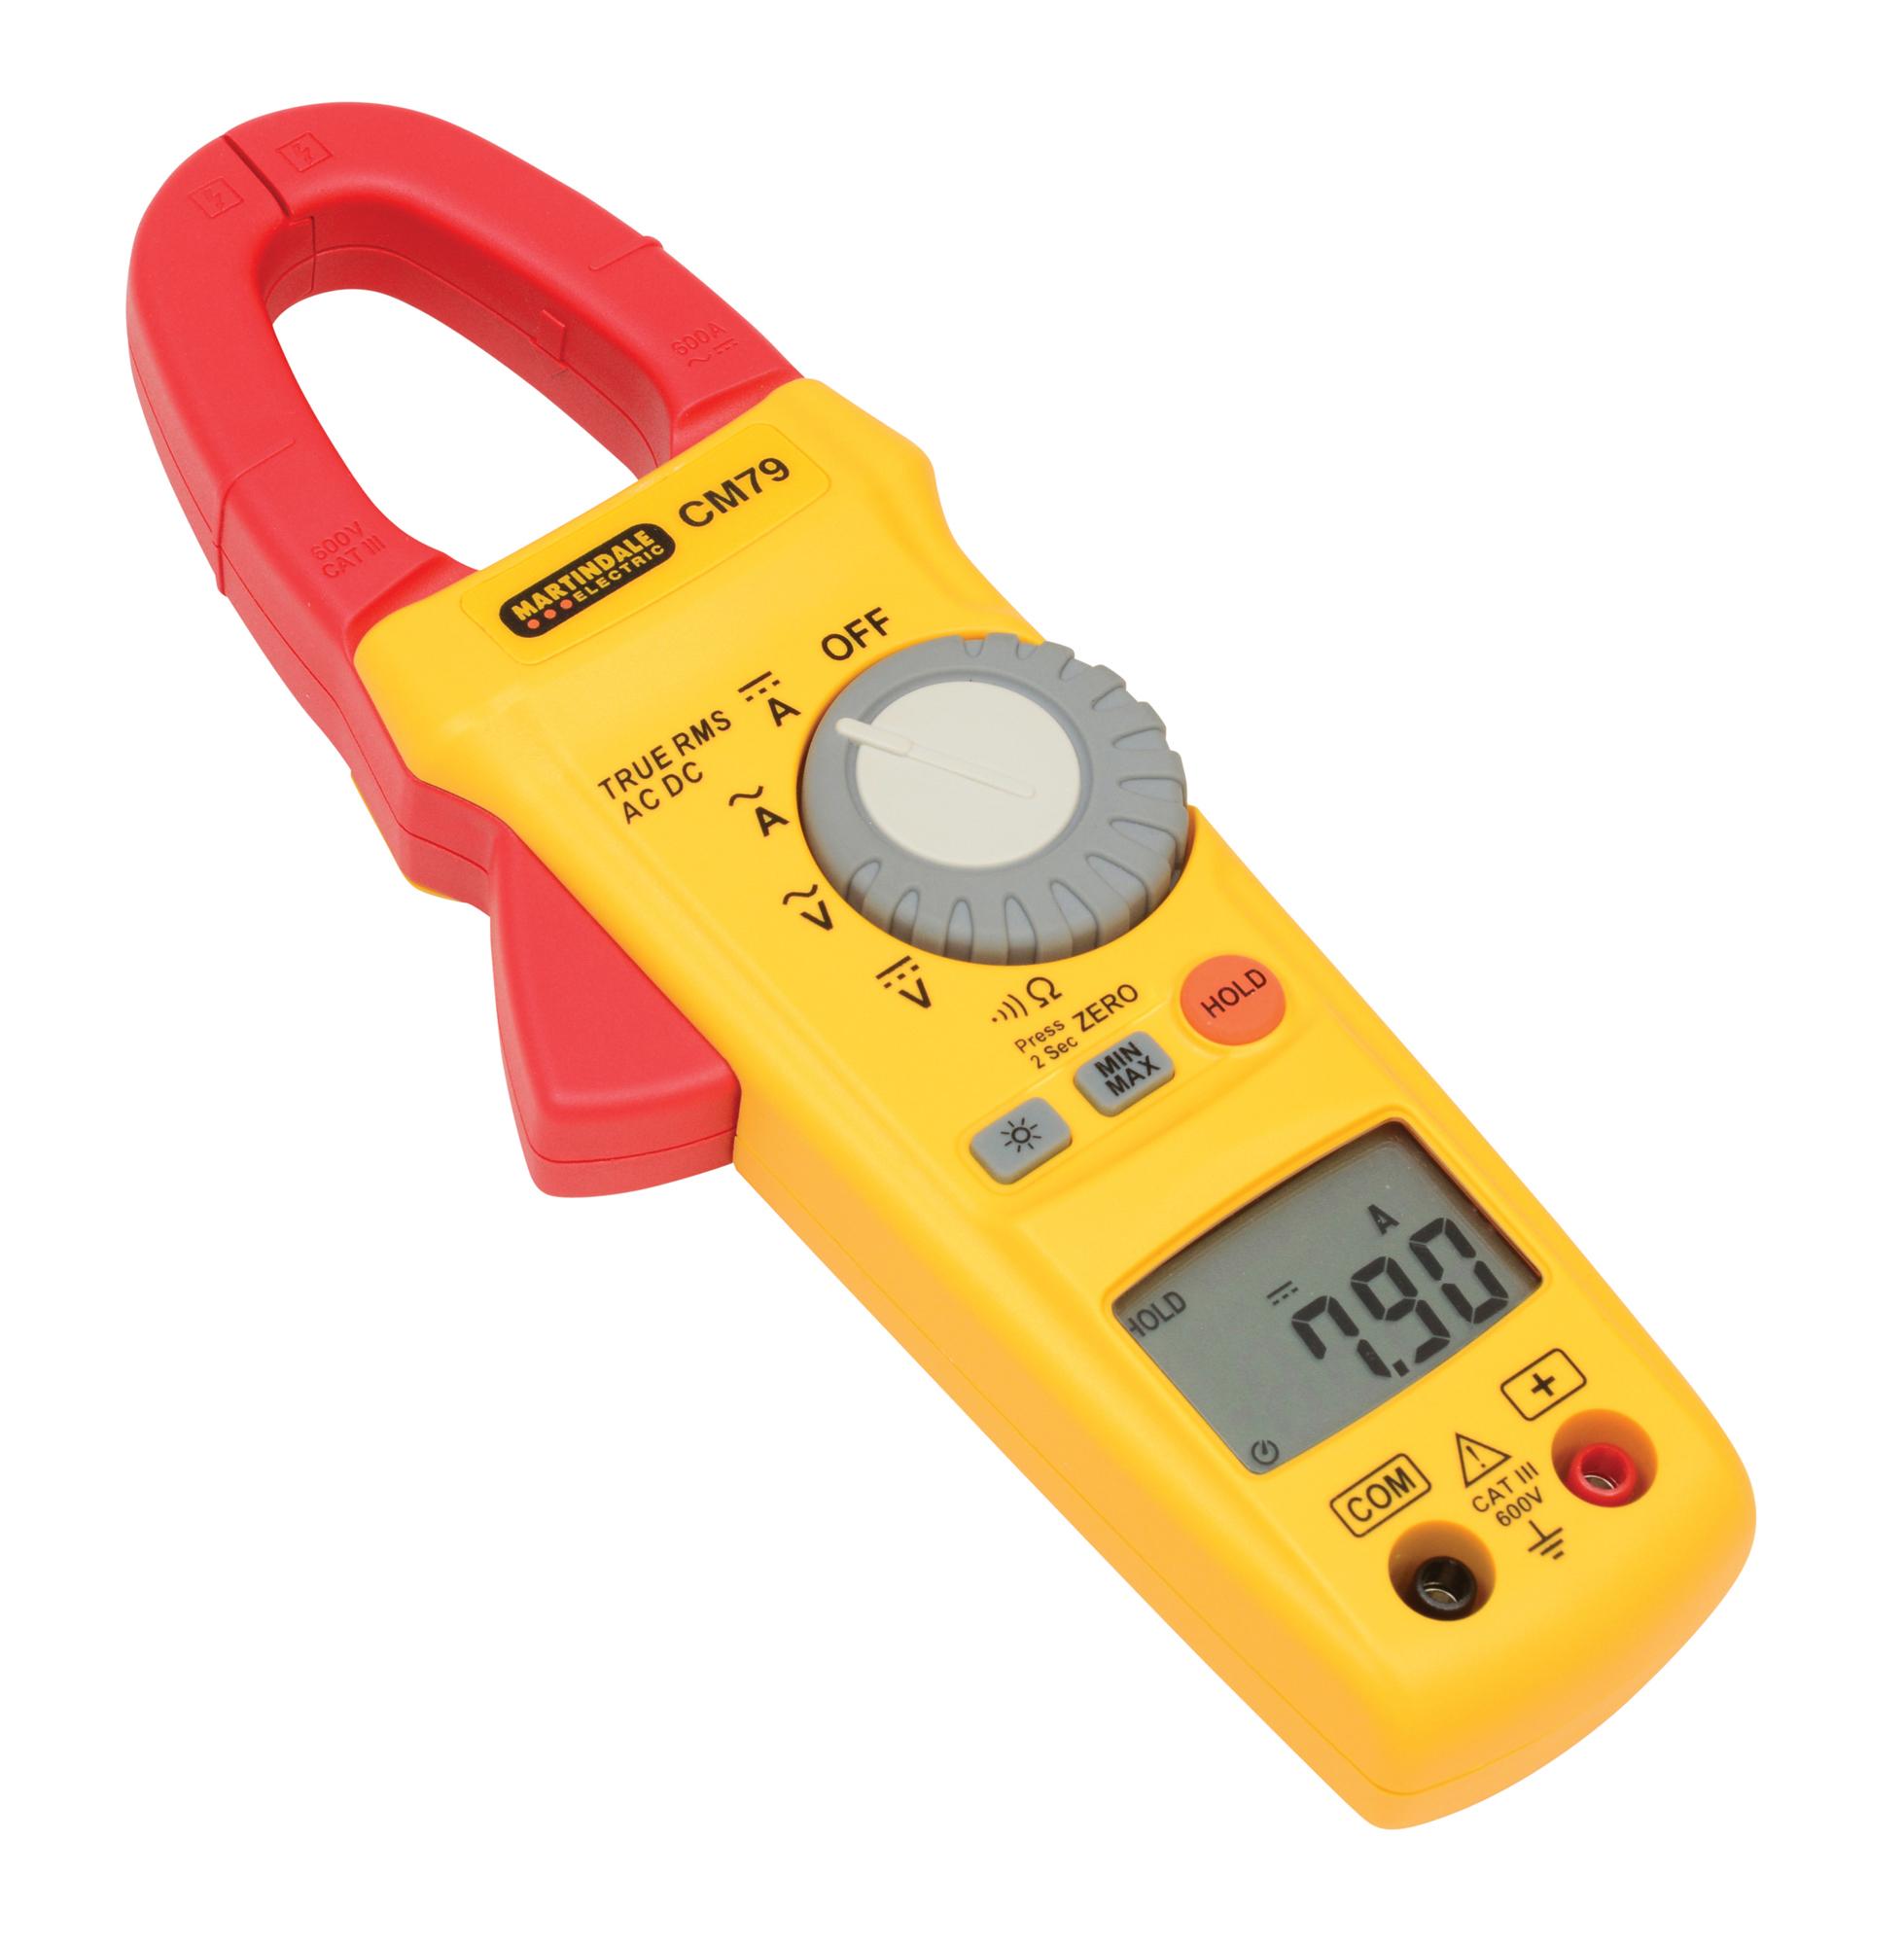 Electrical Clamp Meter : Cm trms ac dc clamp meter